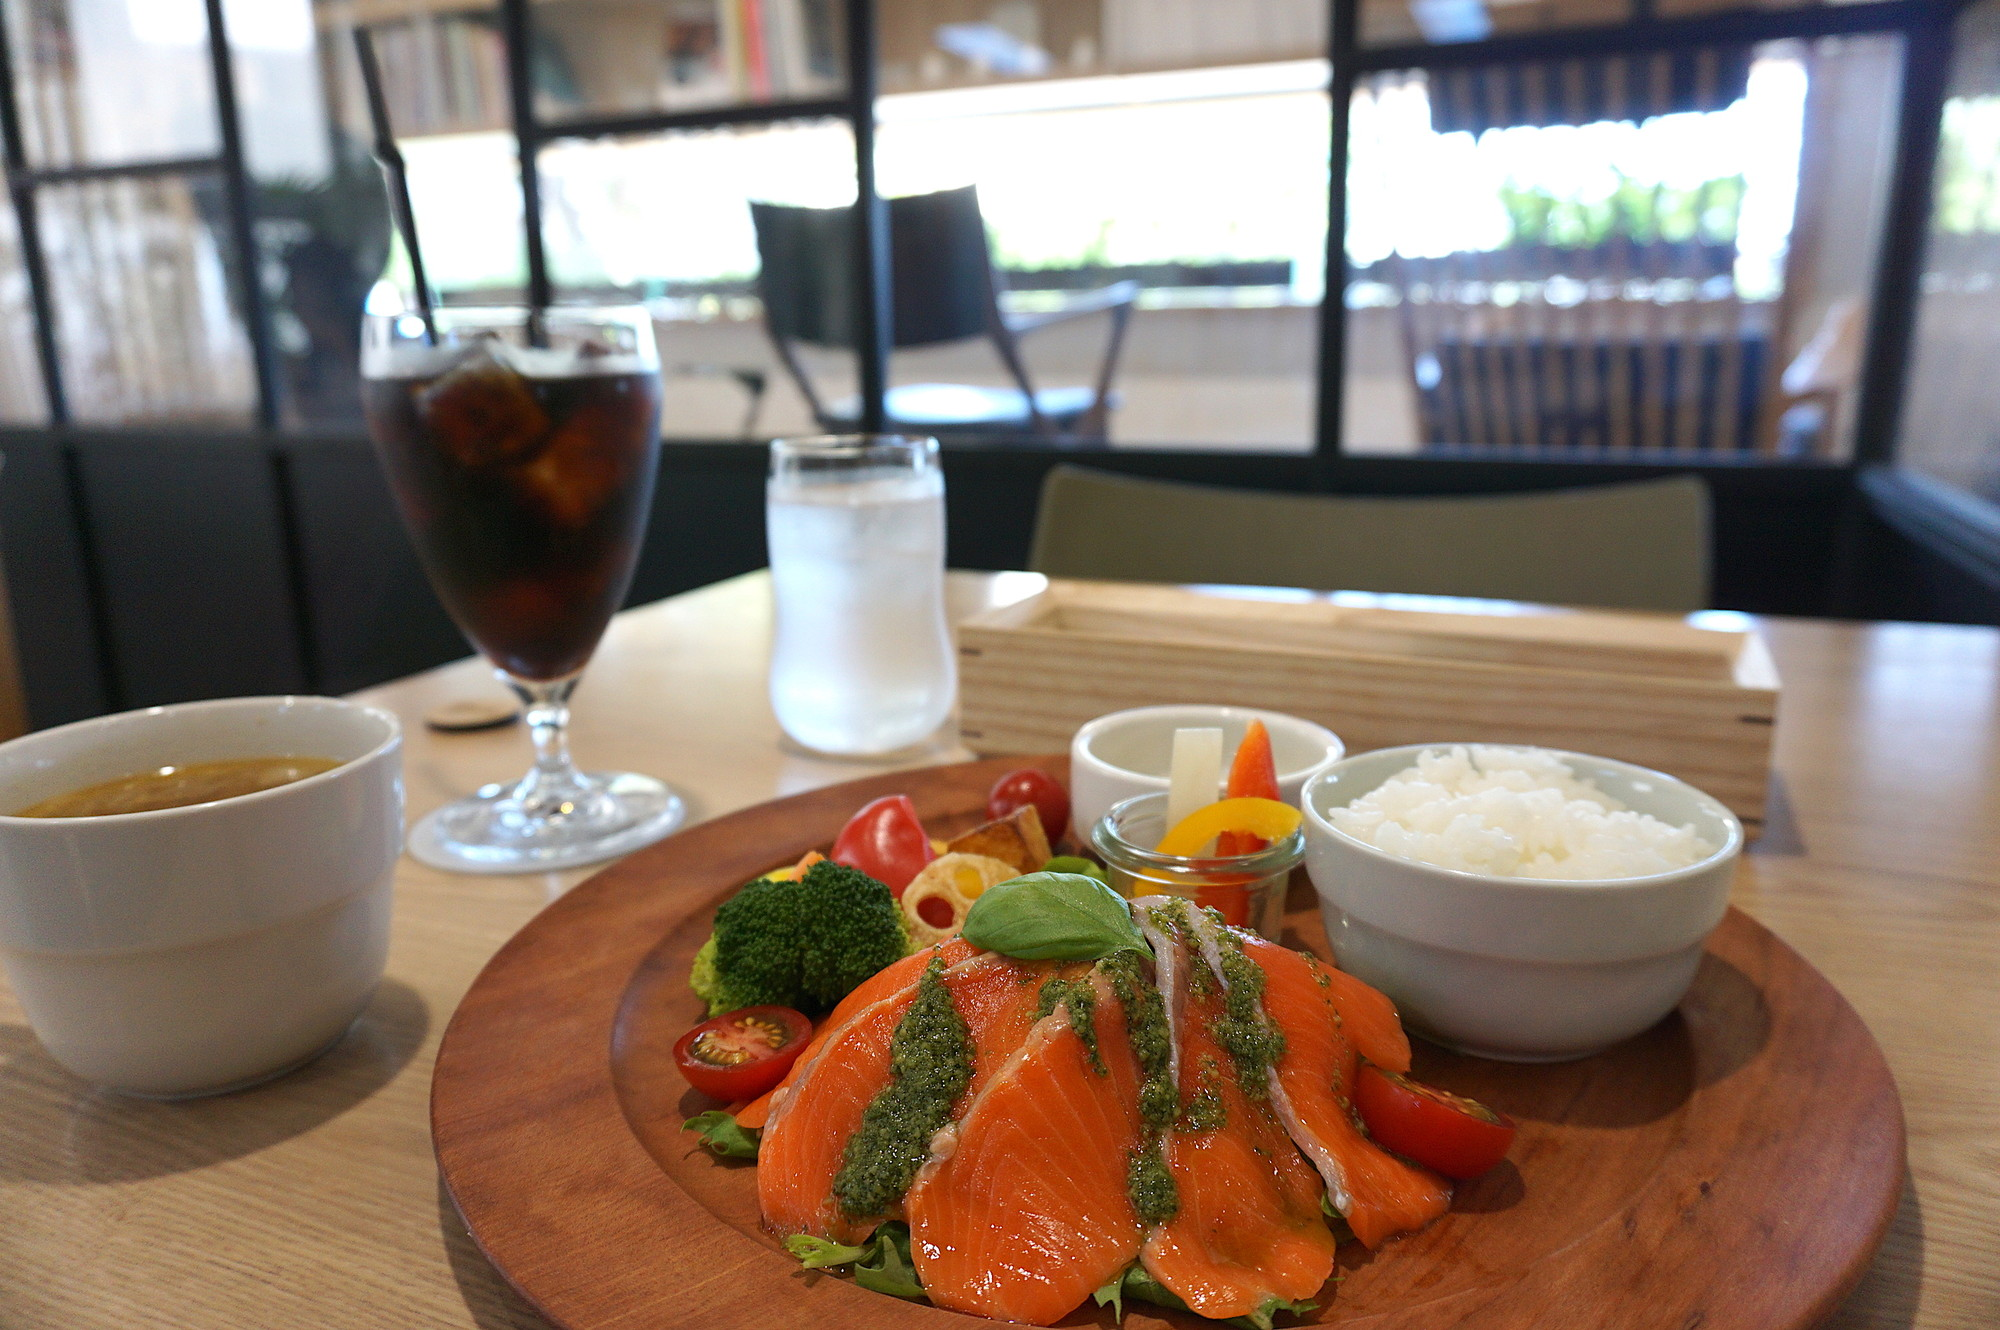 palemta cafe&dining(パレンタ・カフェ&ダイニング)。日替わりメニューは地元野菜たっぷり